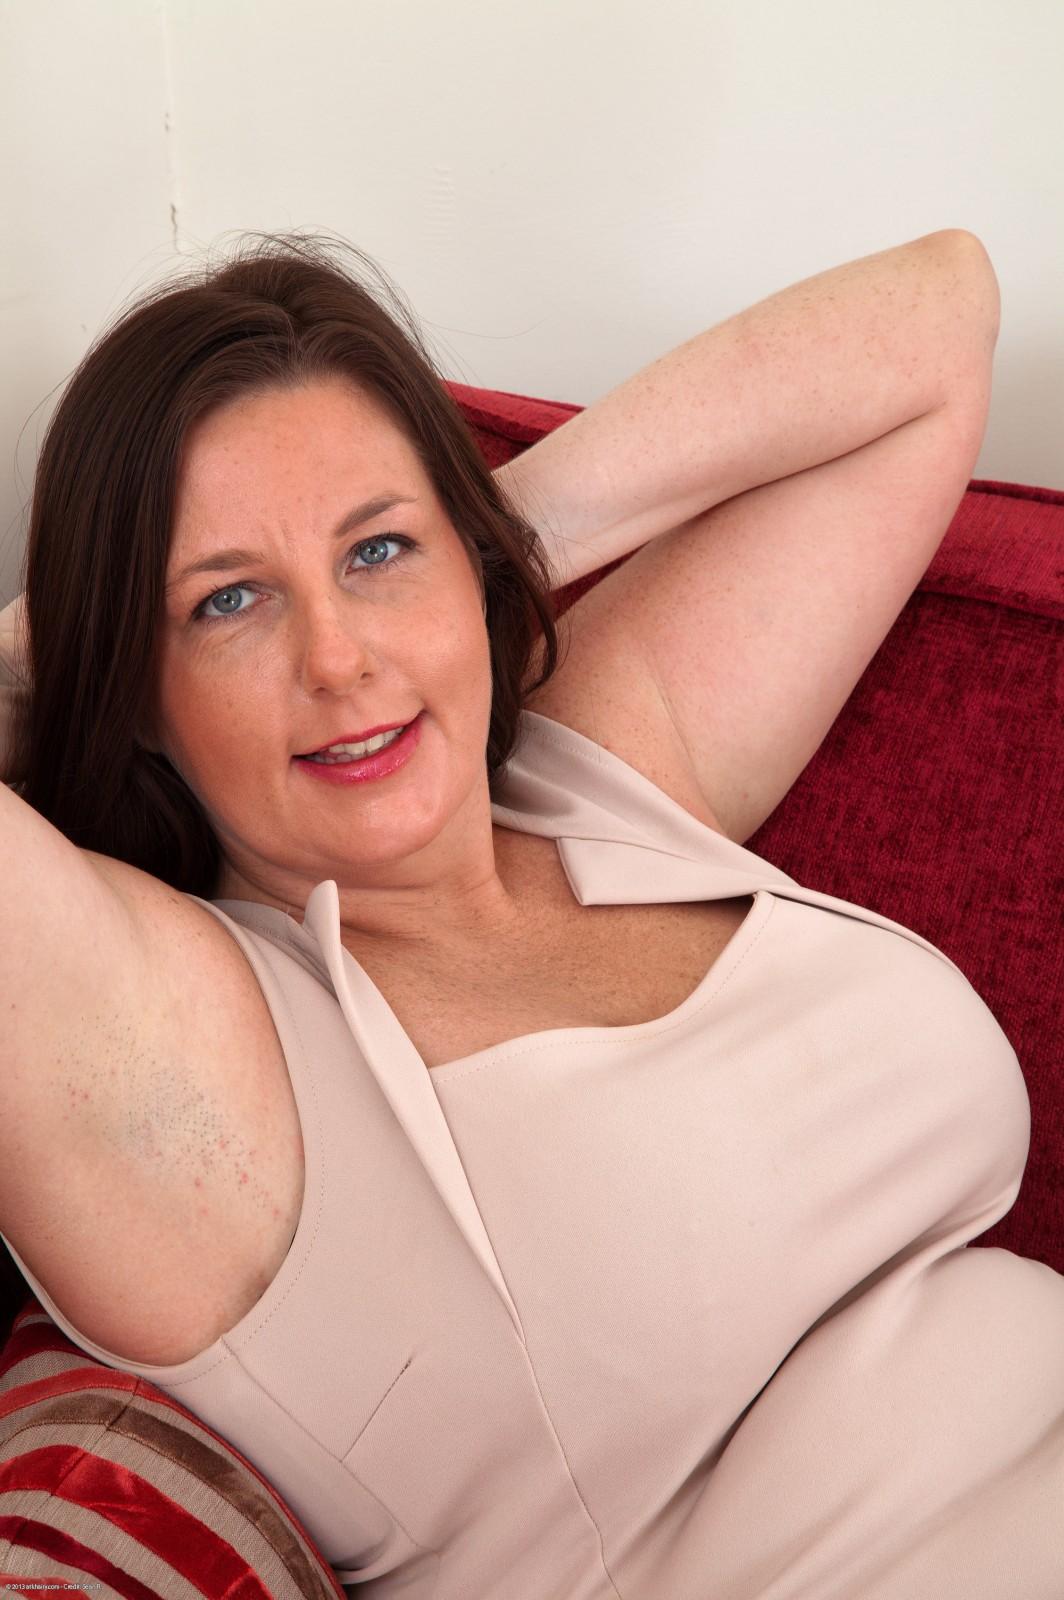 Amateur british matures nude